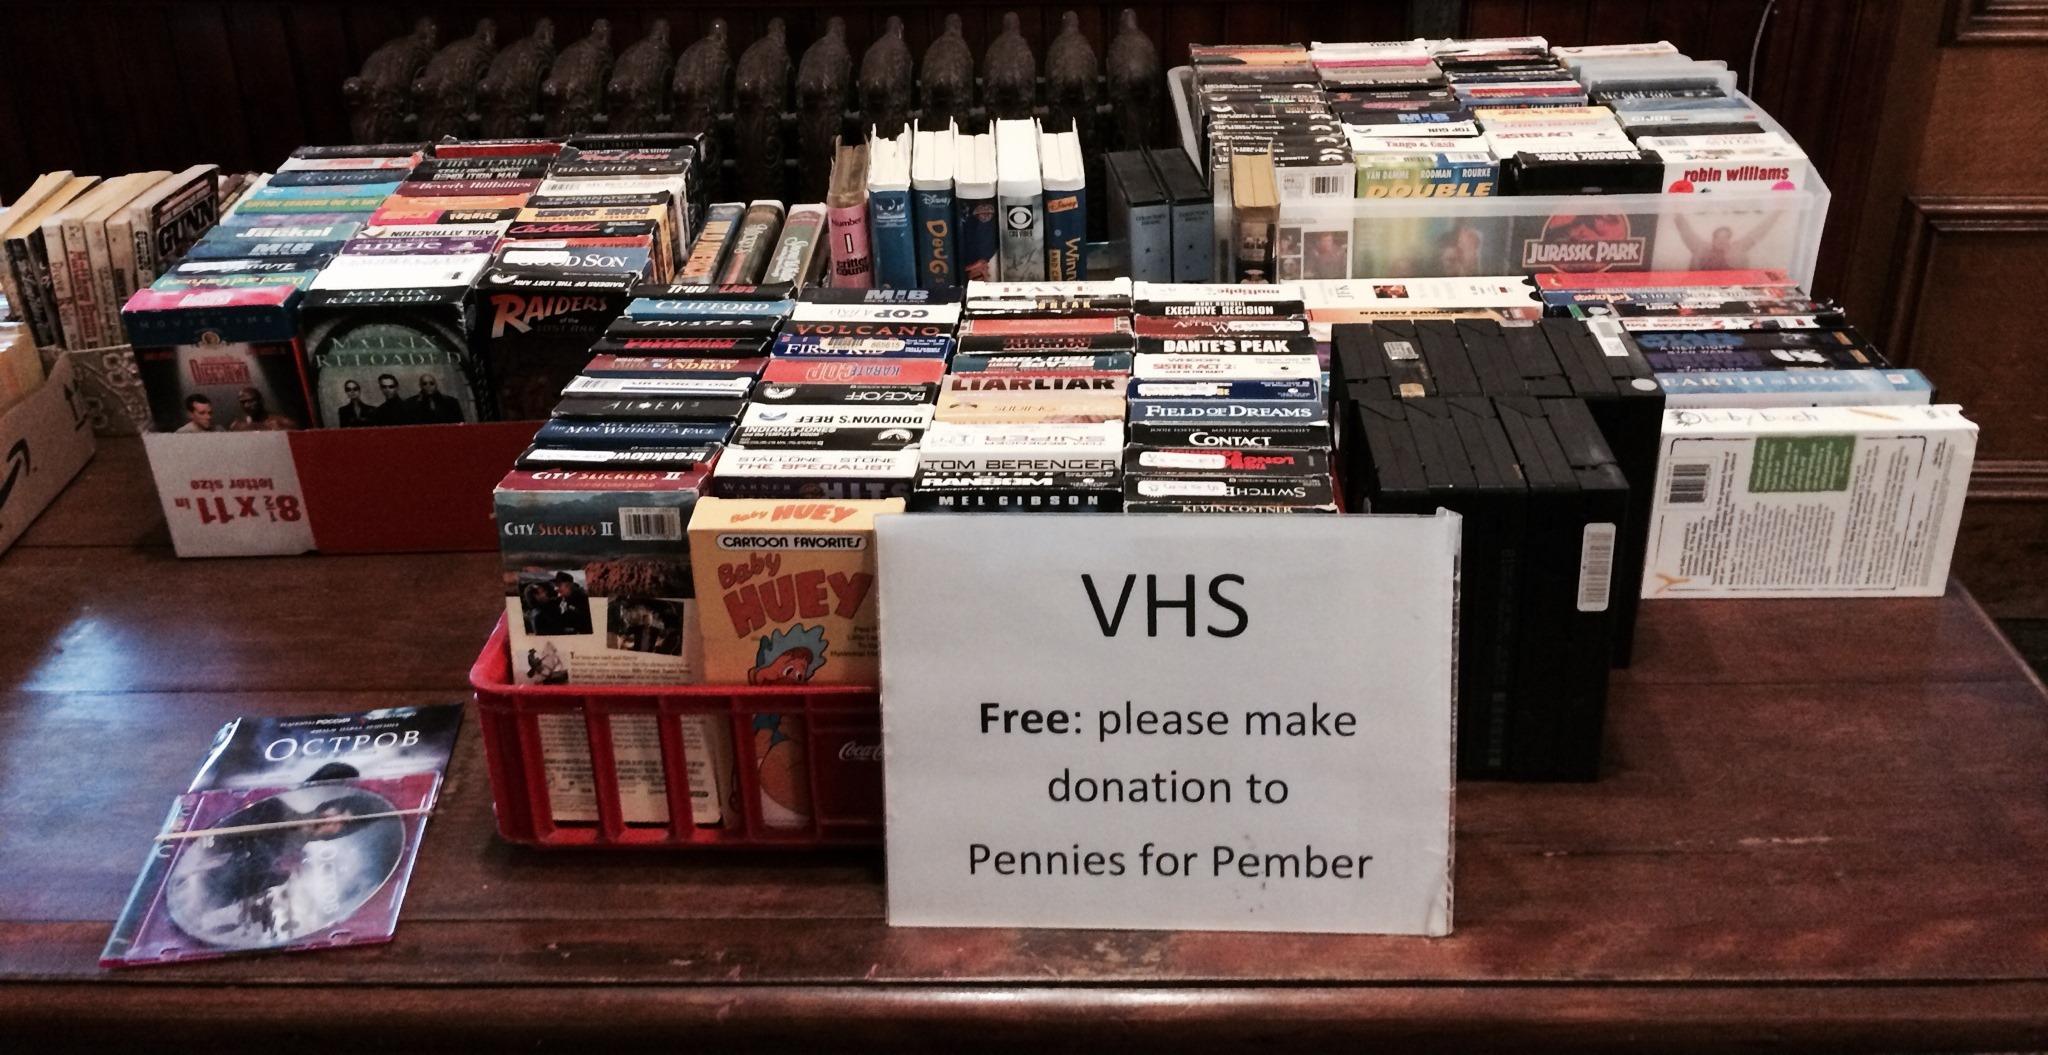 VHS Free